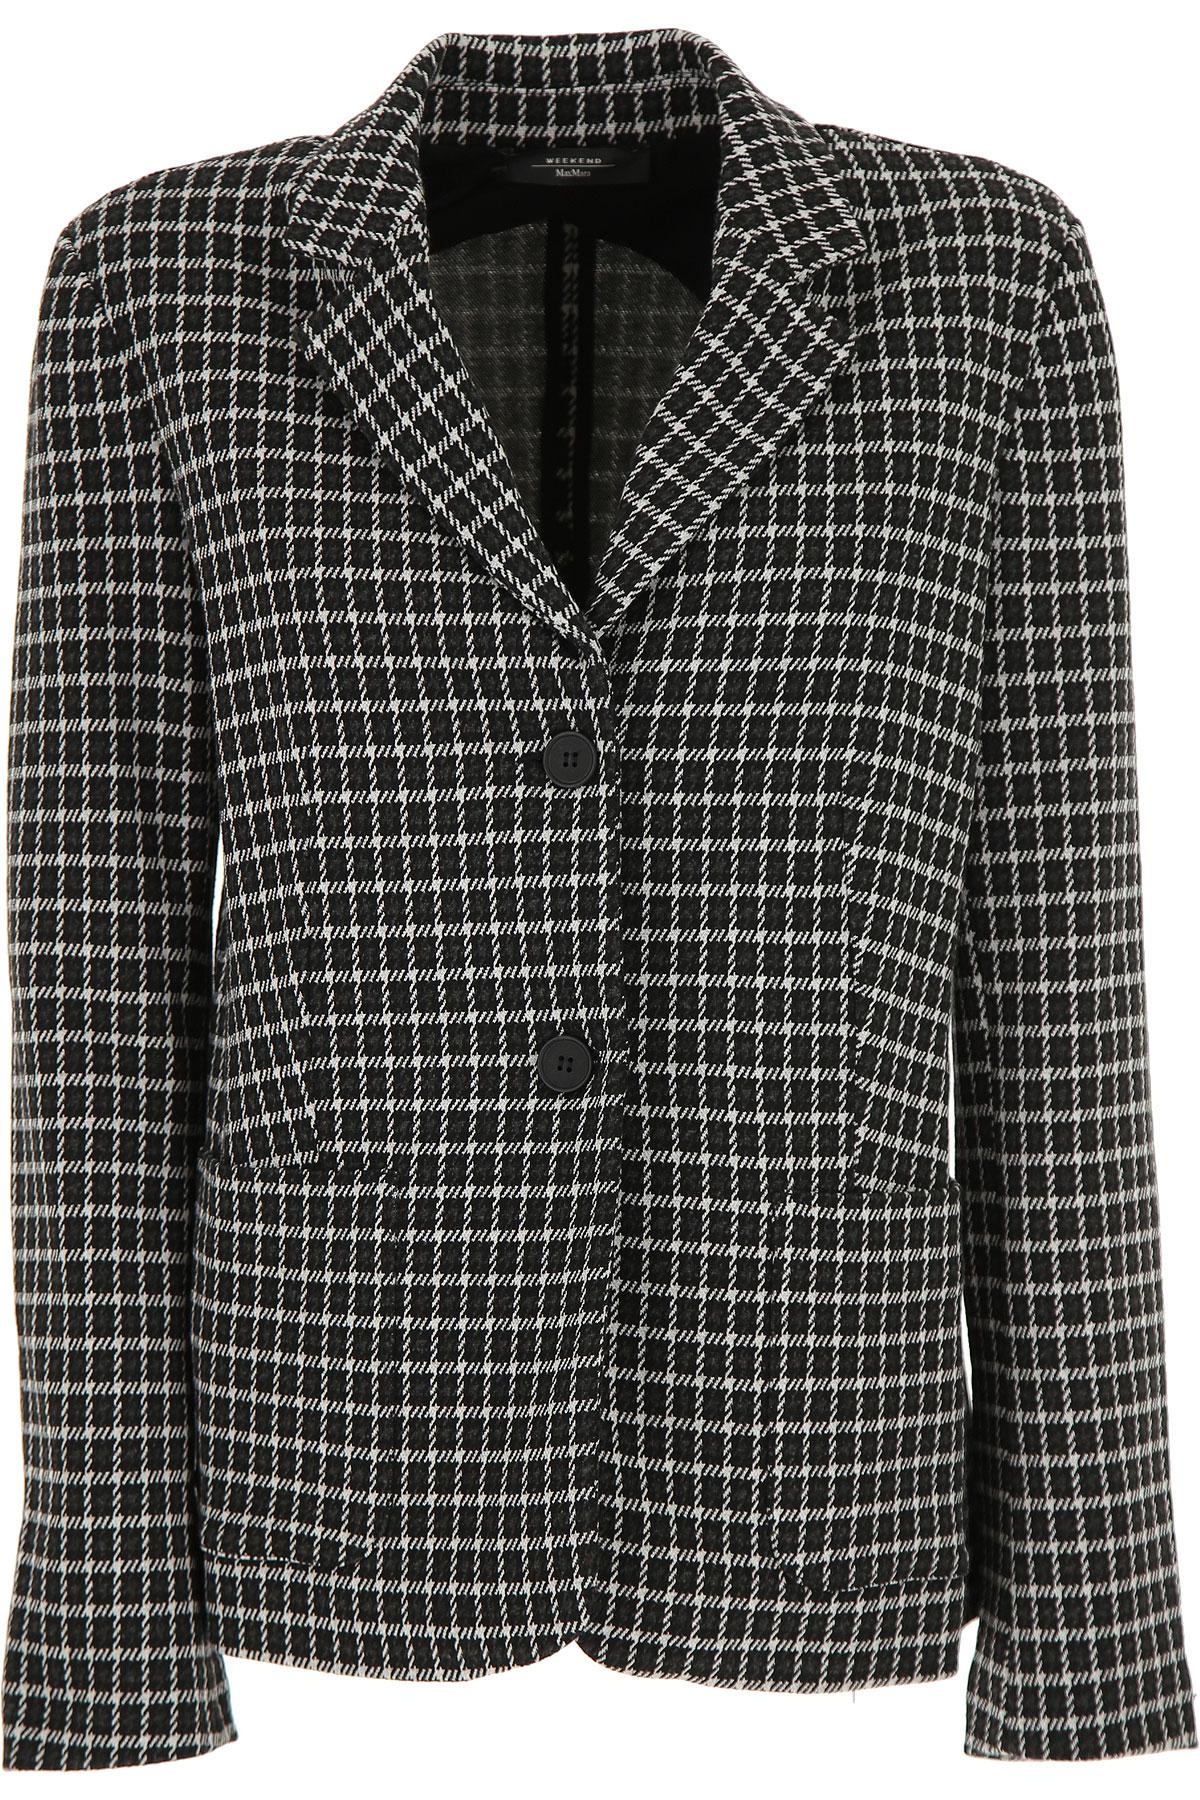 Max Mara Blazer for Women On Sale, Black, Viscose, 2019, 10 4 6 8